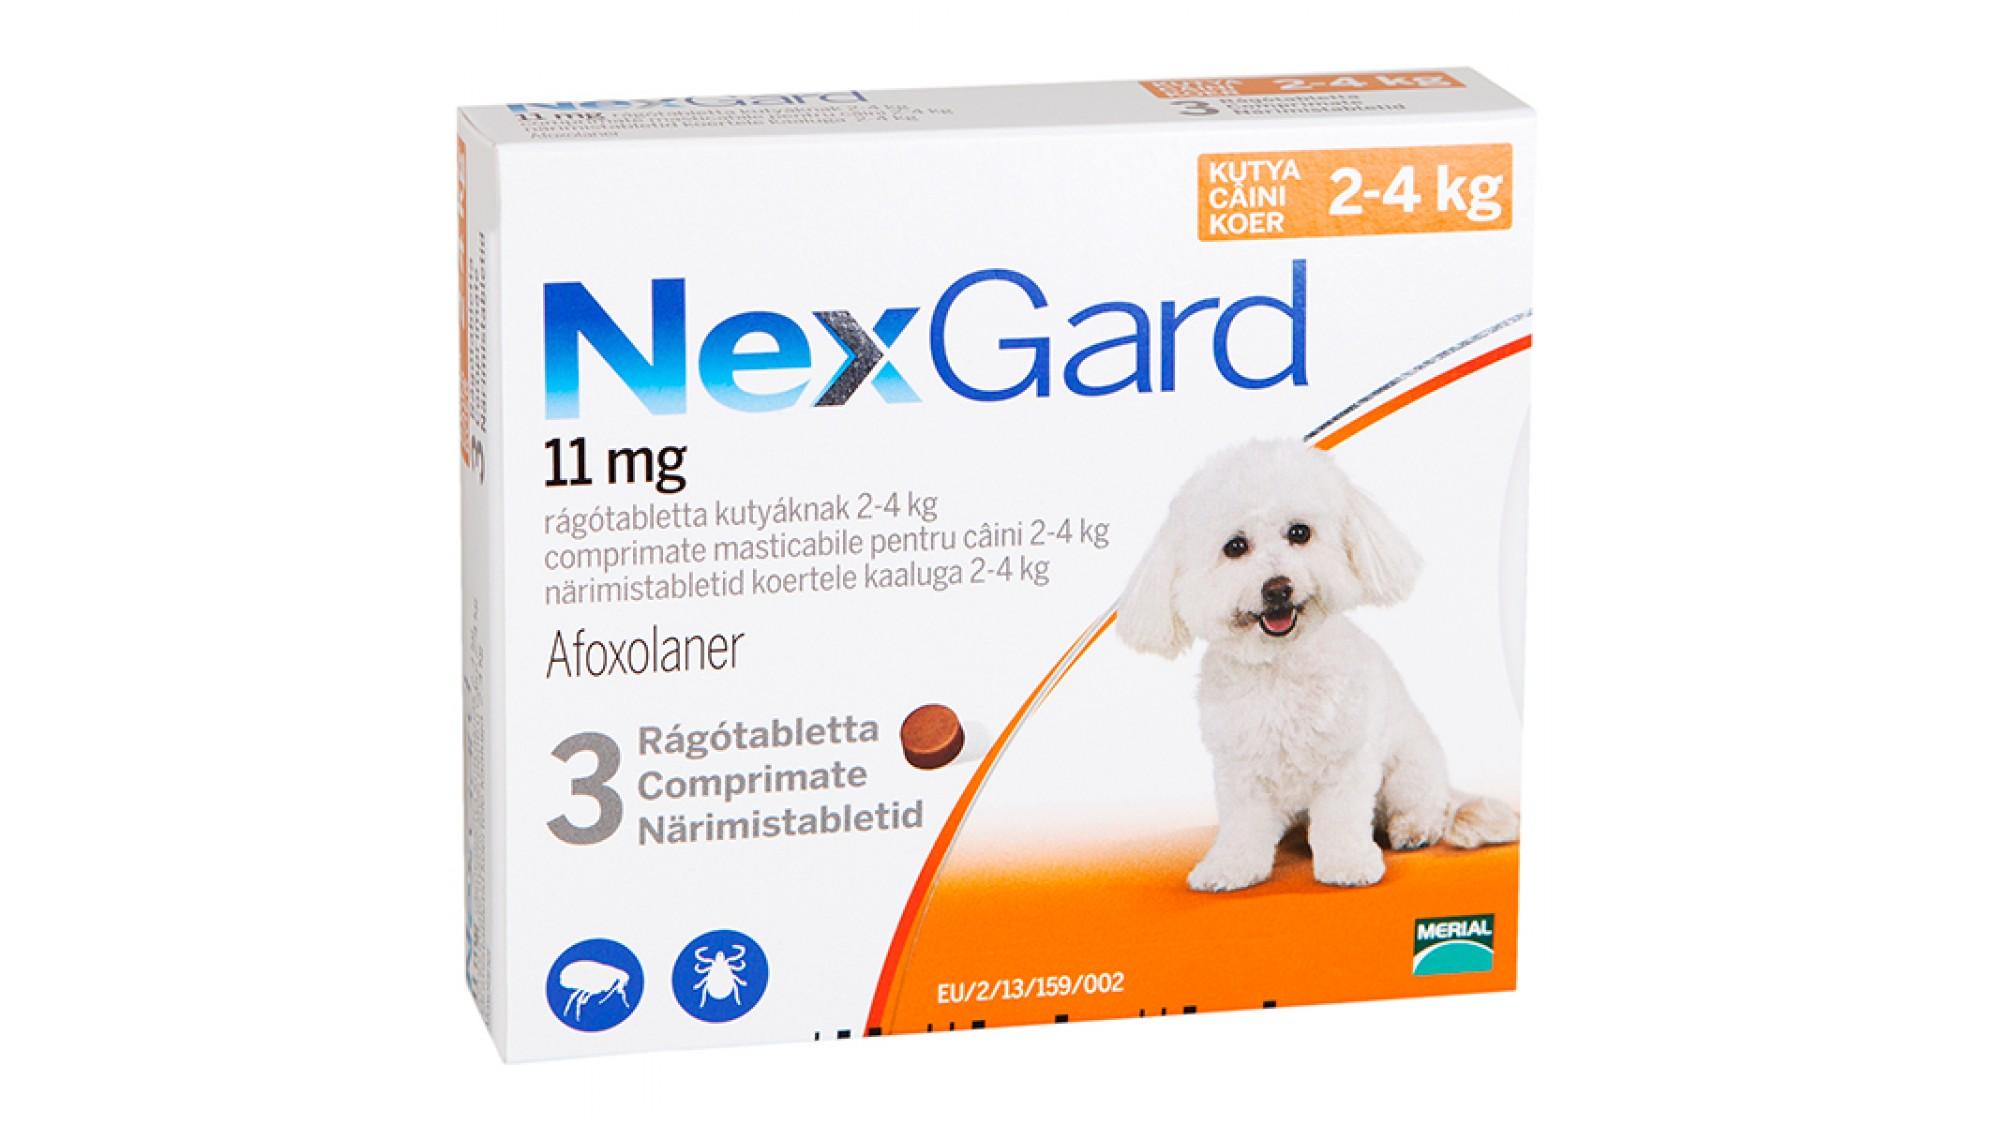 Nexgard Dog S 2-4 Kg 11 Mg x 3 Tablete shop4pet.ro